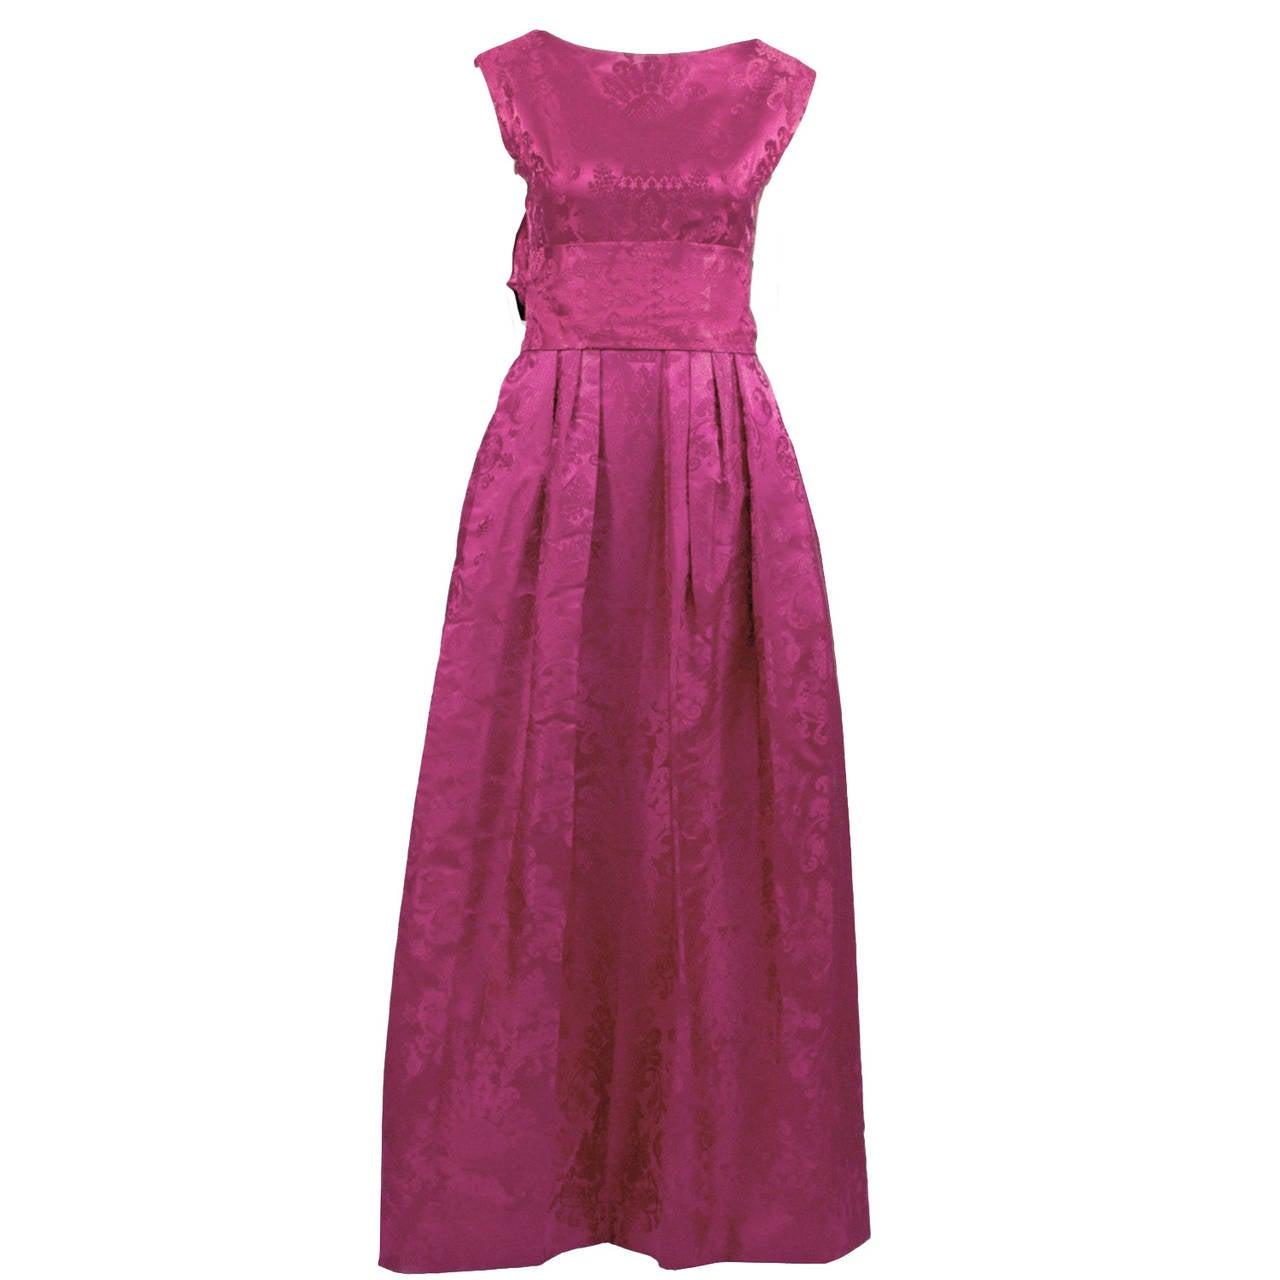 1950s Paris Vintage Dress Pink Satin Jacquard Formal Evening Gown at 1stdibs